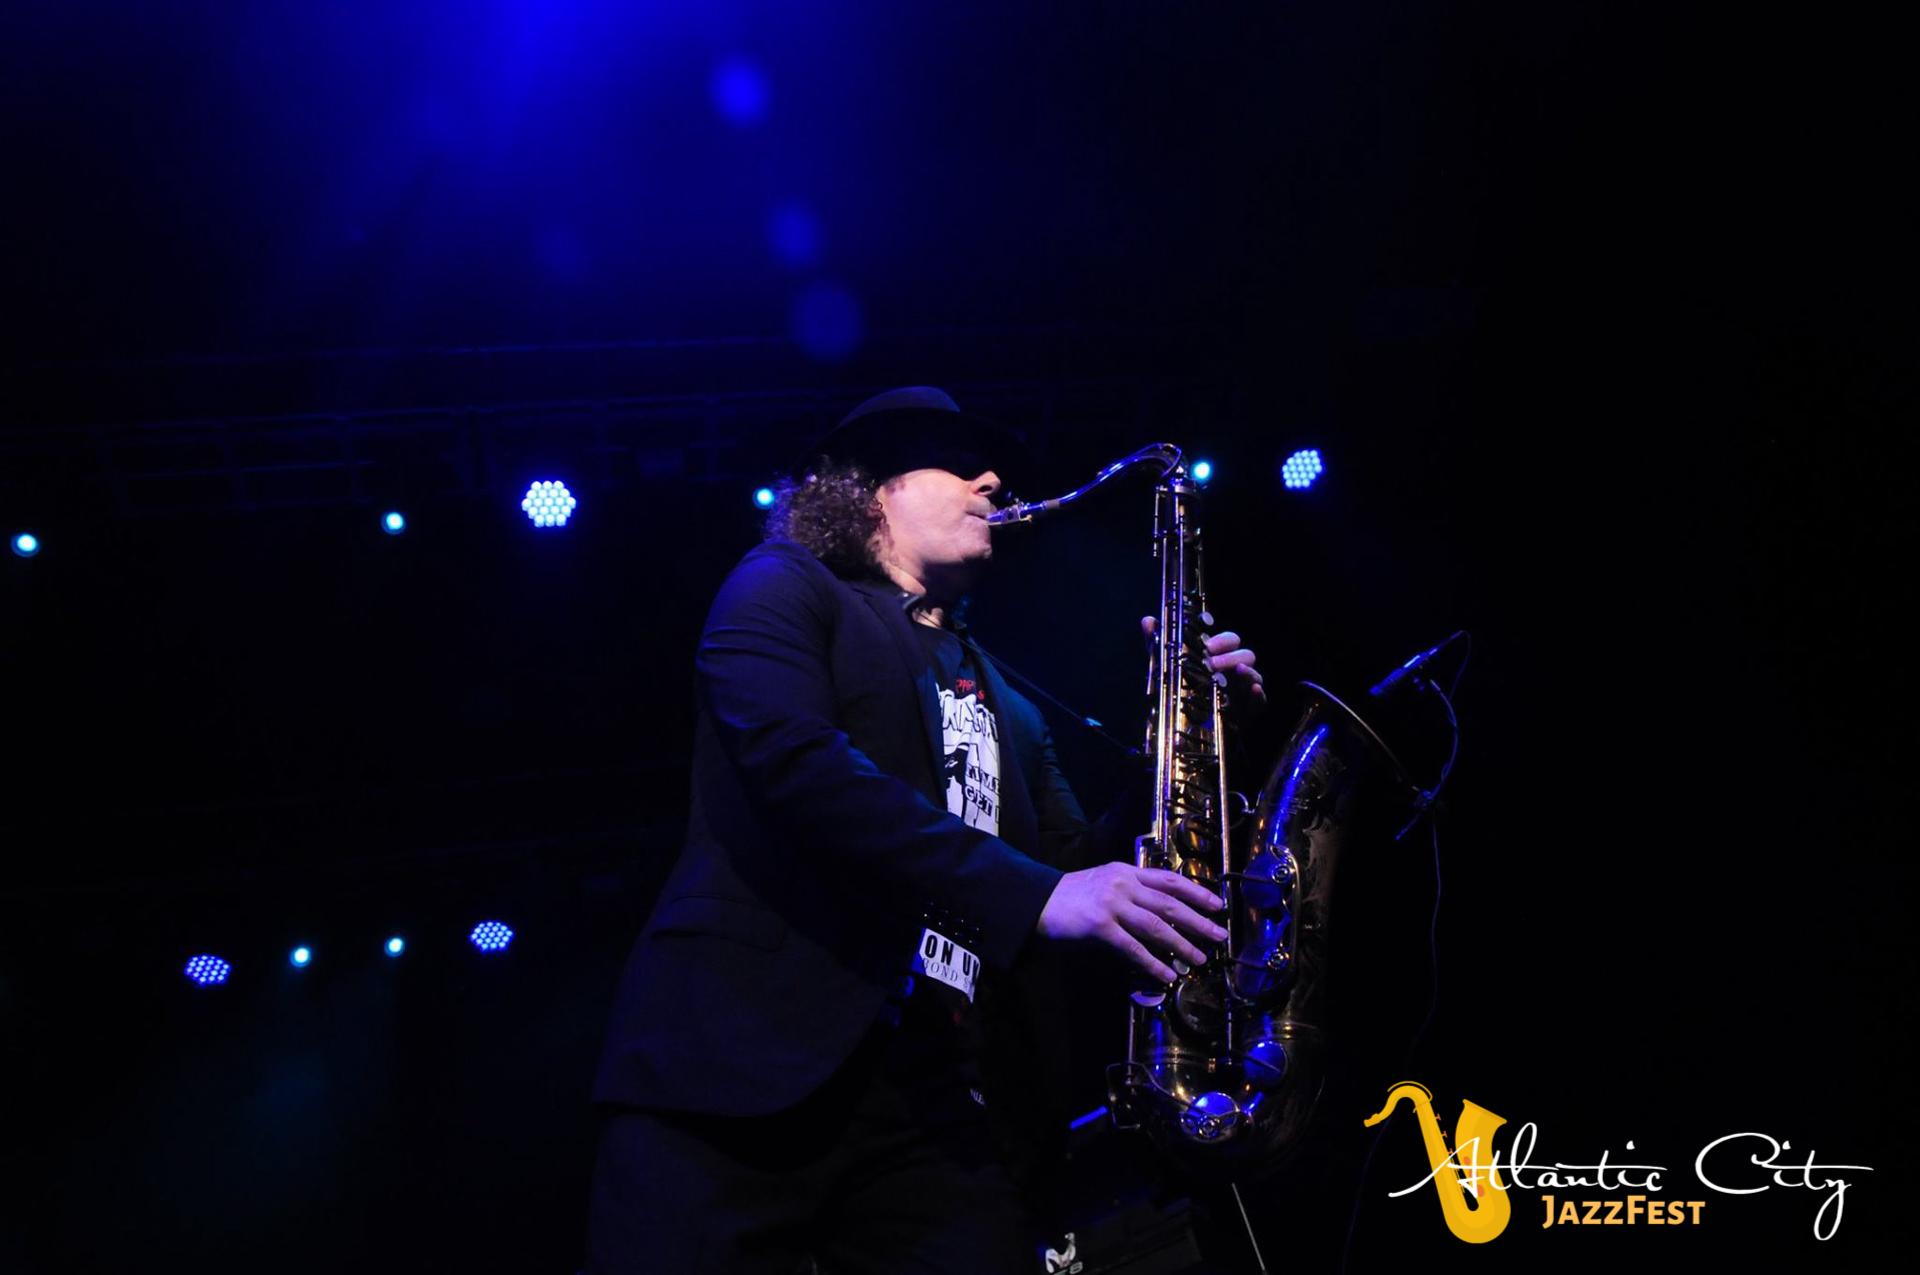 2019 Jazz Fest Picture-49